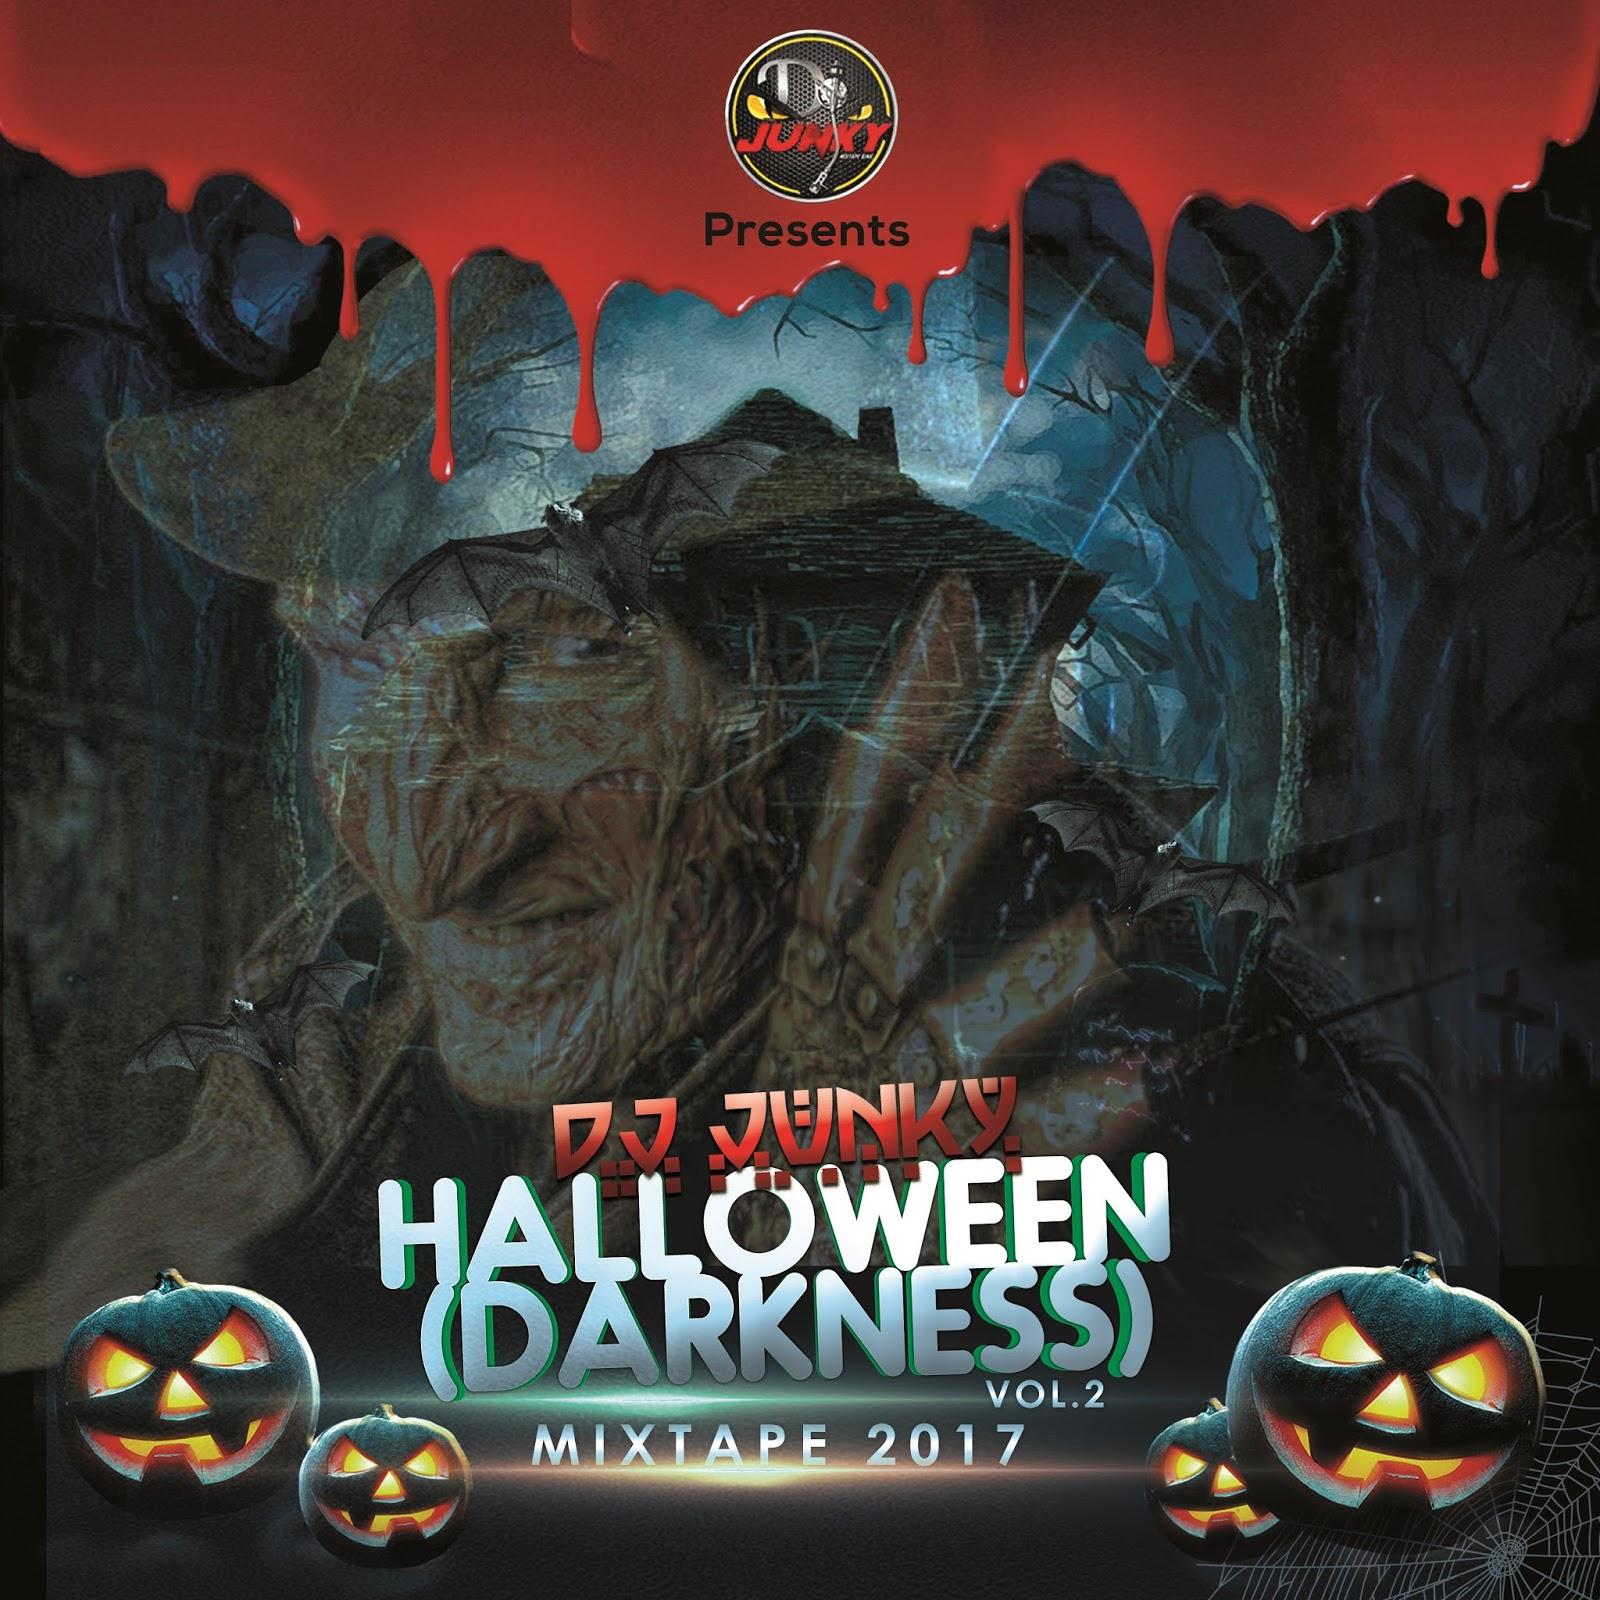 dj junky : djjunky presents - halloween (darkness) vol.2 mixtape 2017